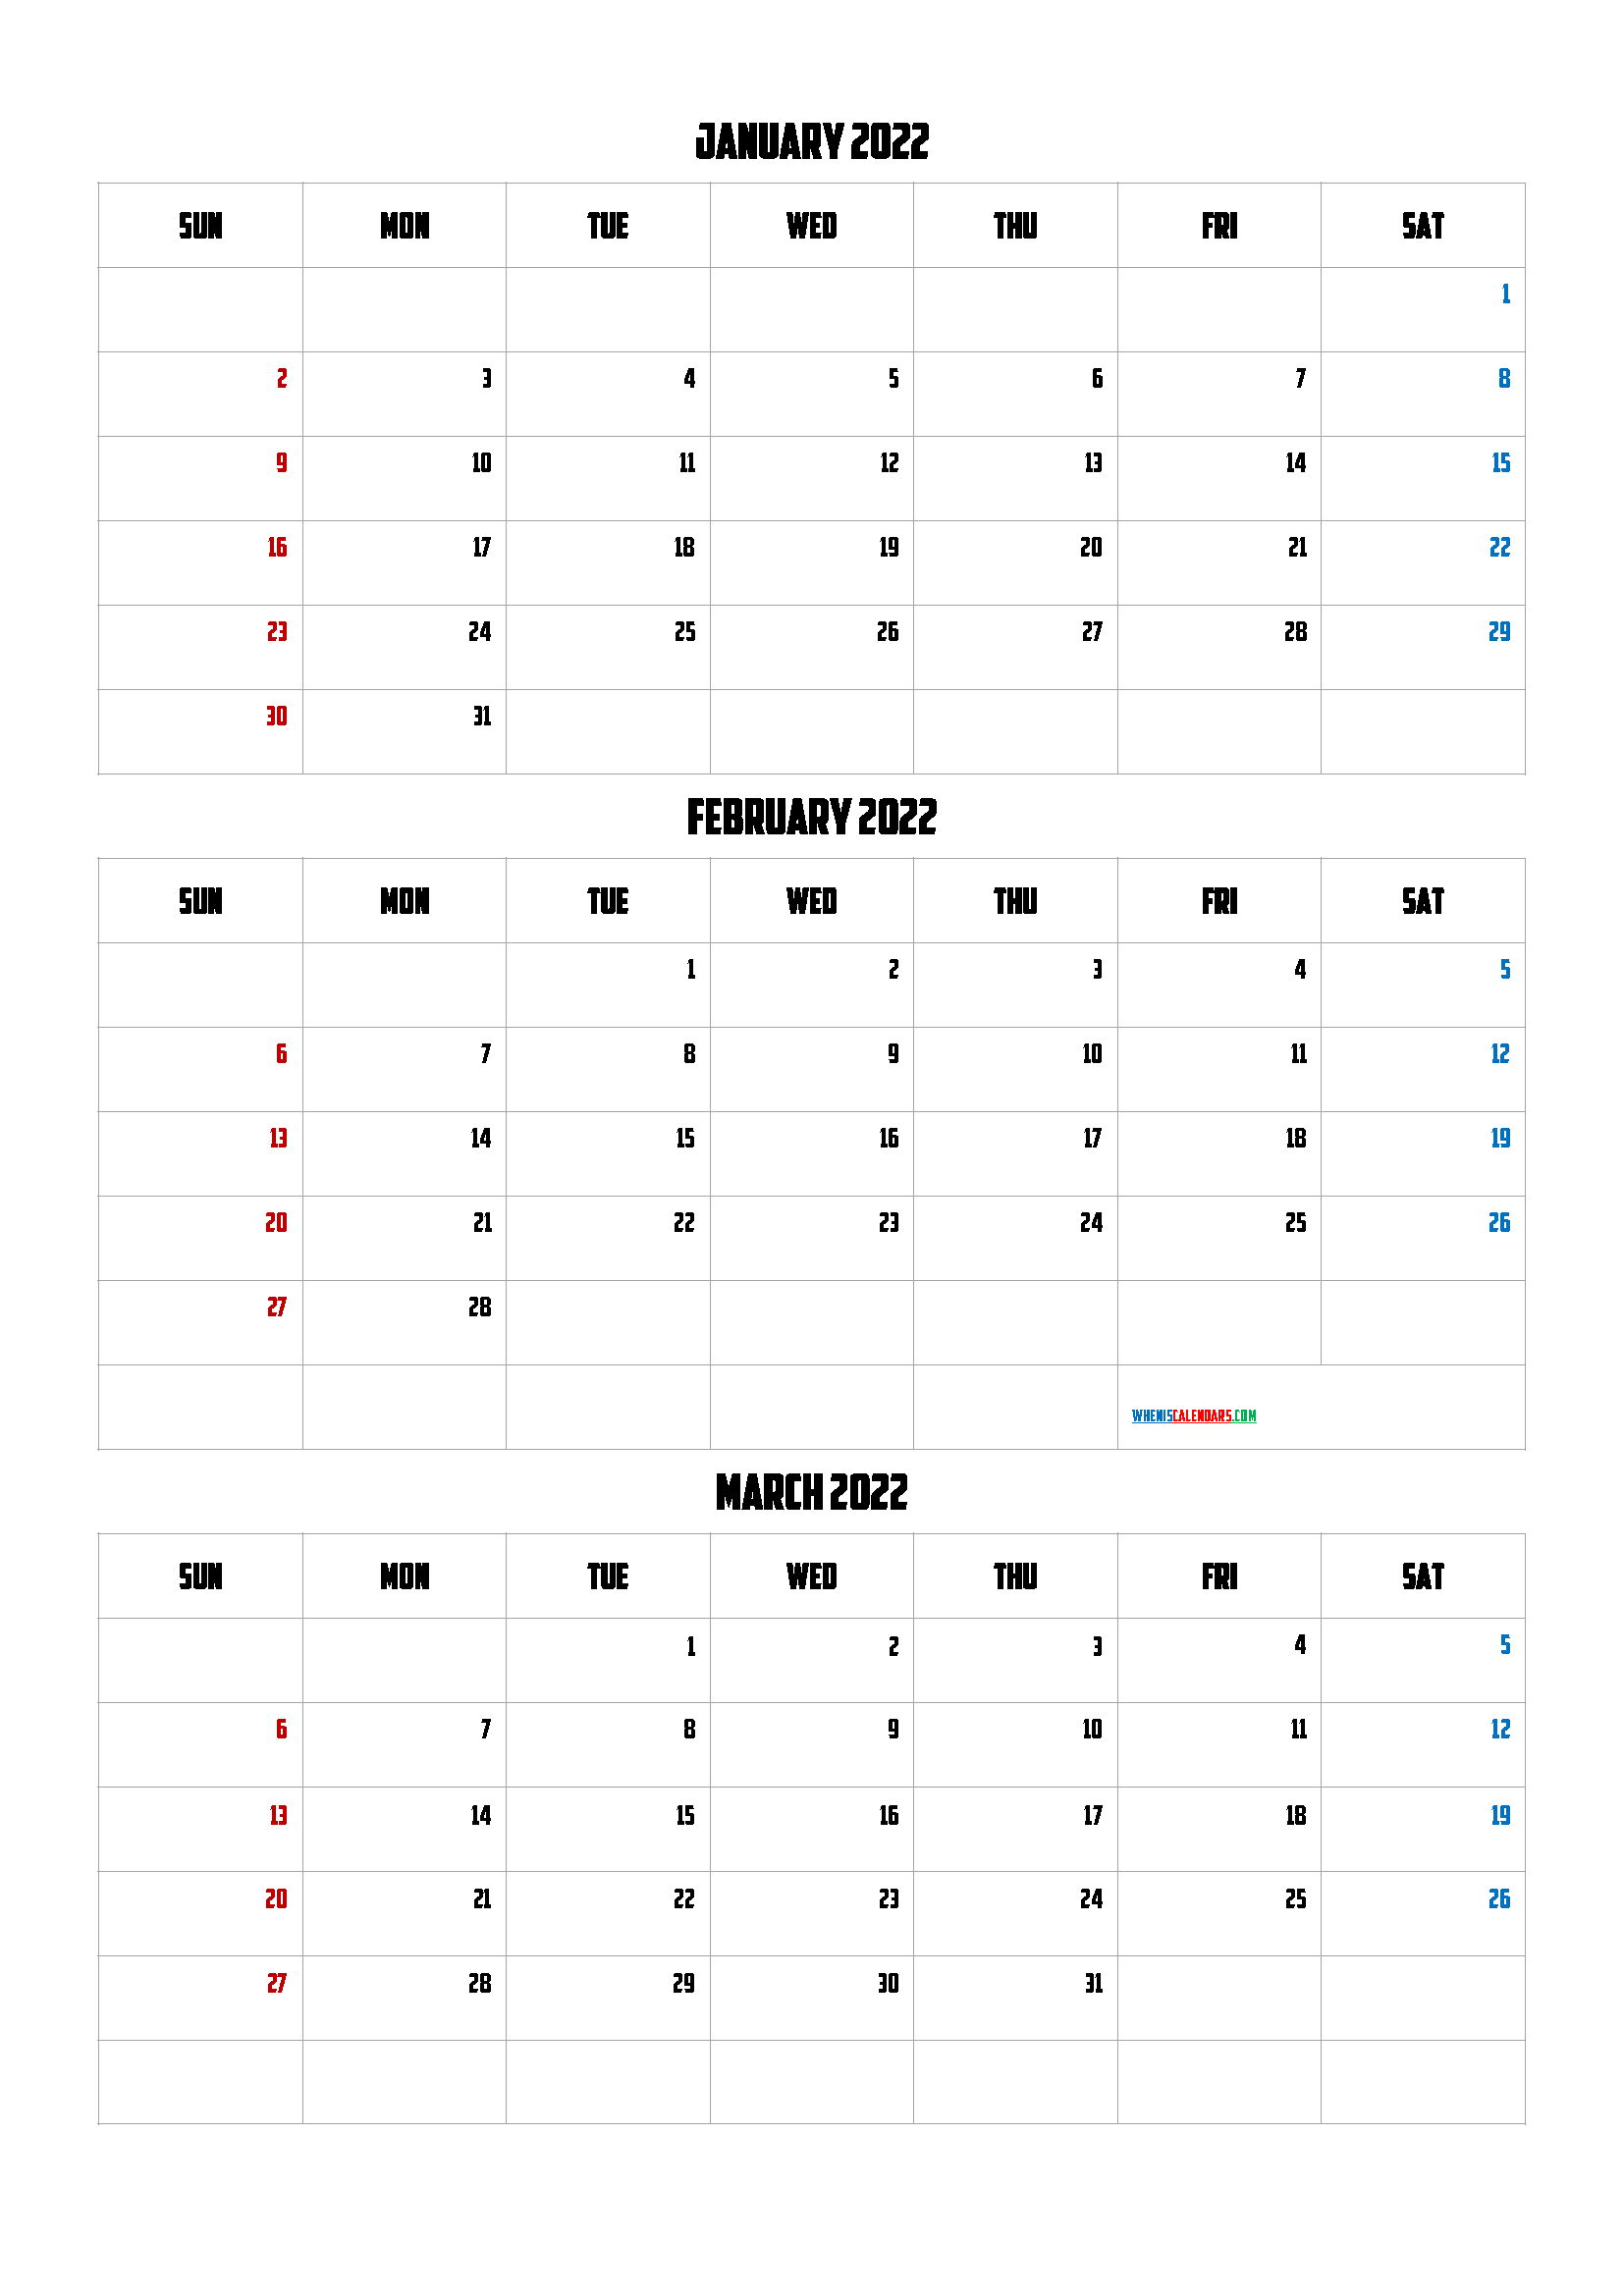 Free January February March 2022 Calendar - Calendraex In March April May June Calendar 2022